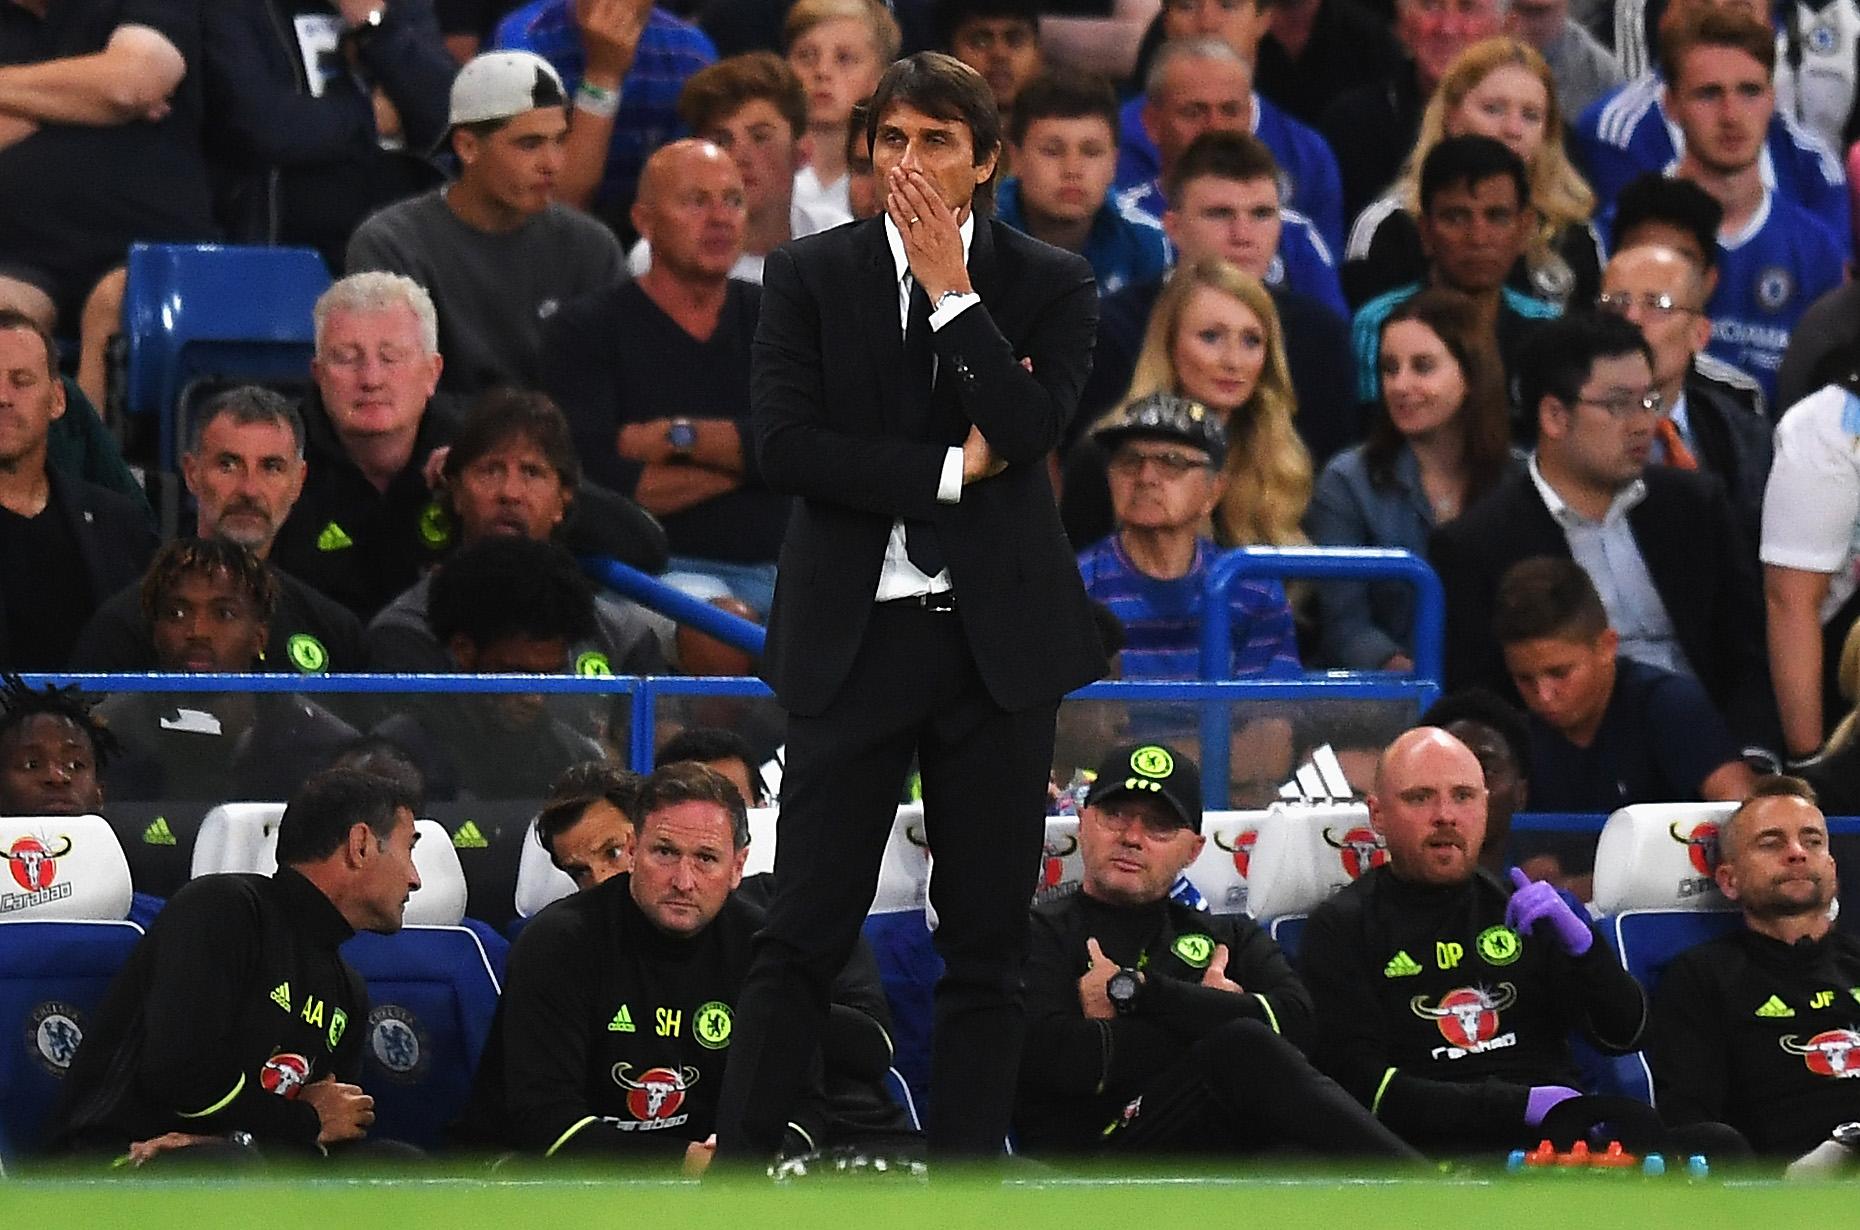 Chelsea: Can Antonio Conte now play his preferred formation?